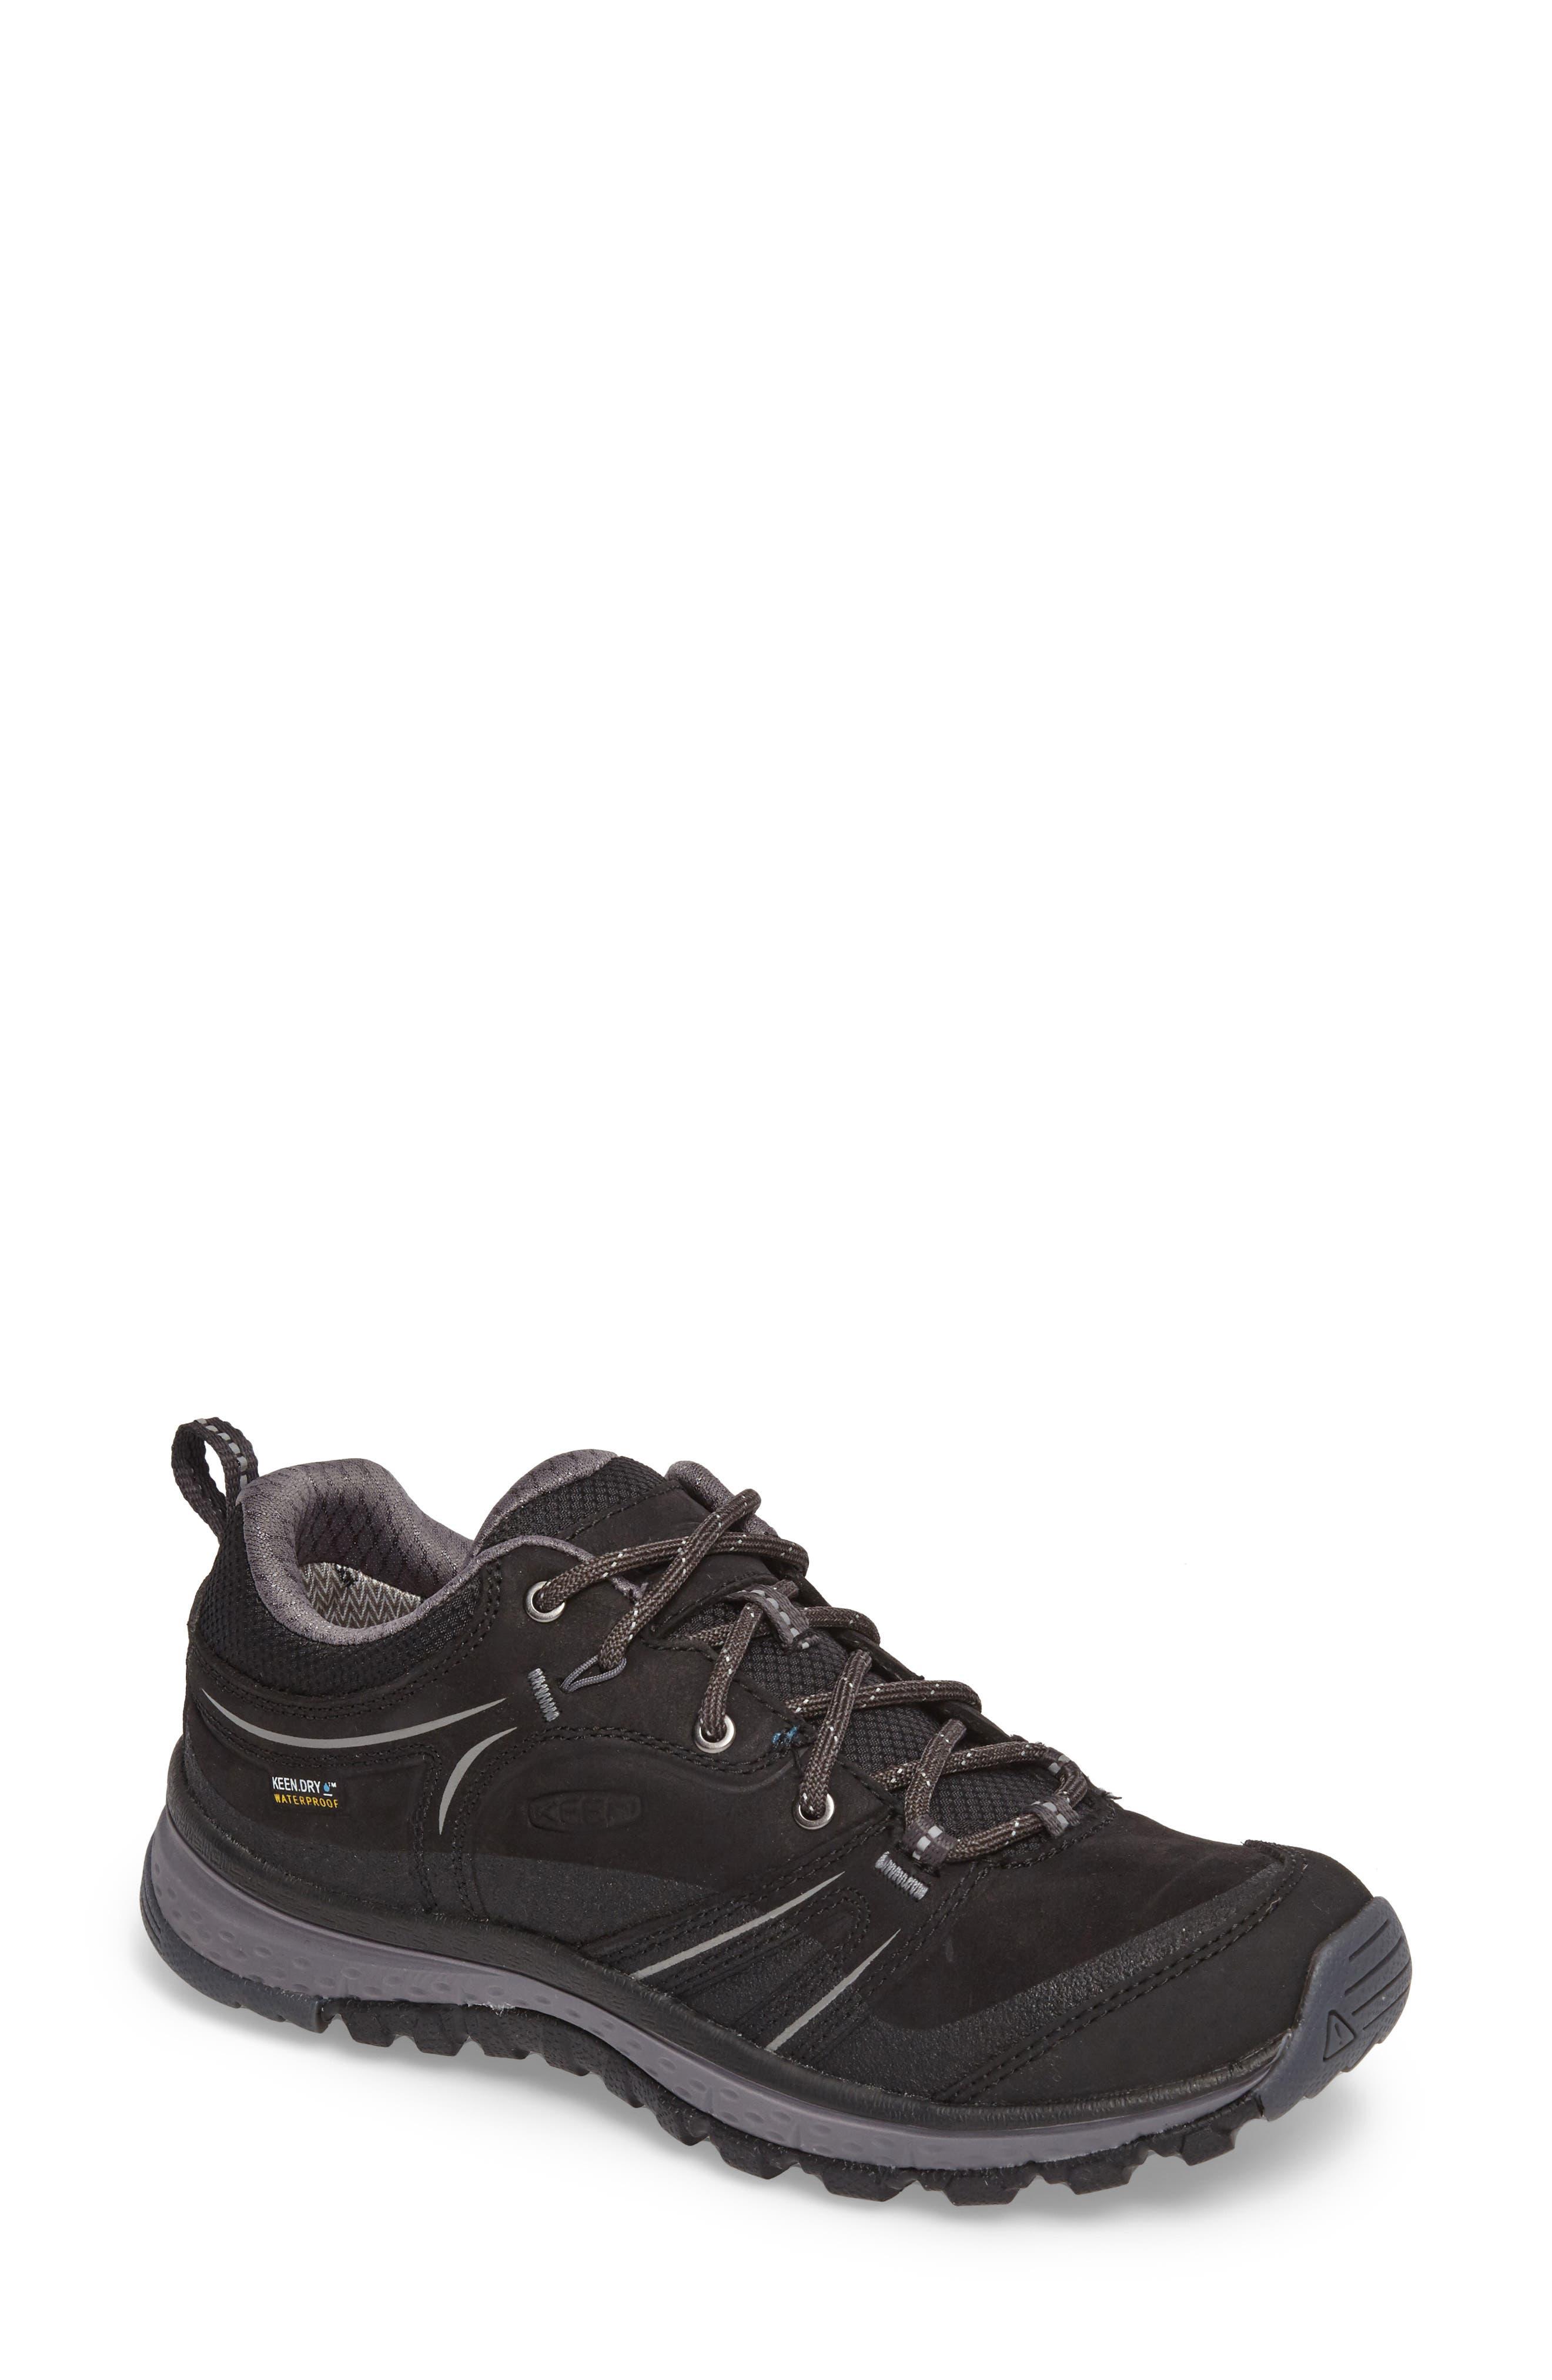 Terradora Waterproof Hiking Shoe,                         Main,                         color, 012